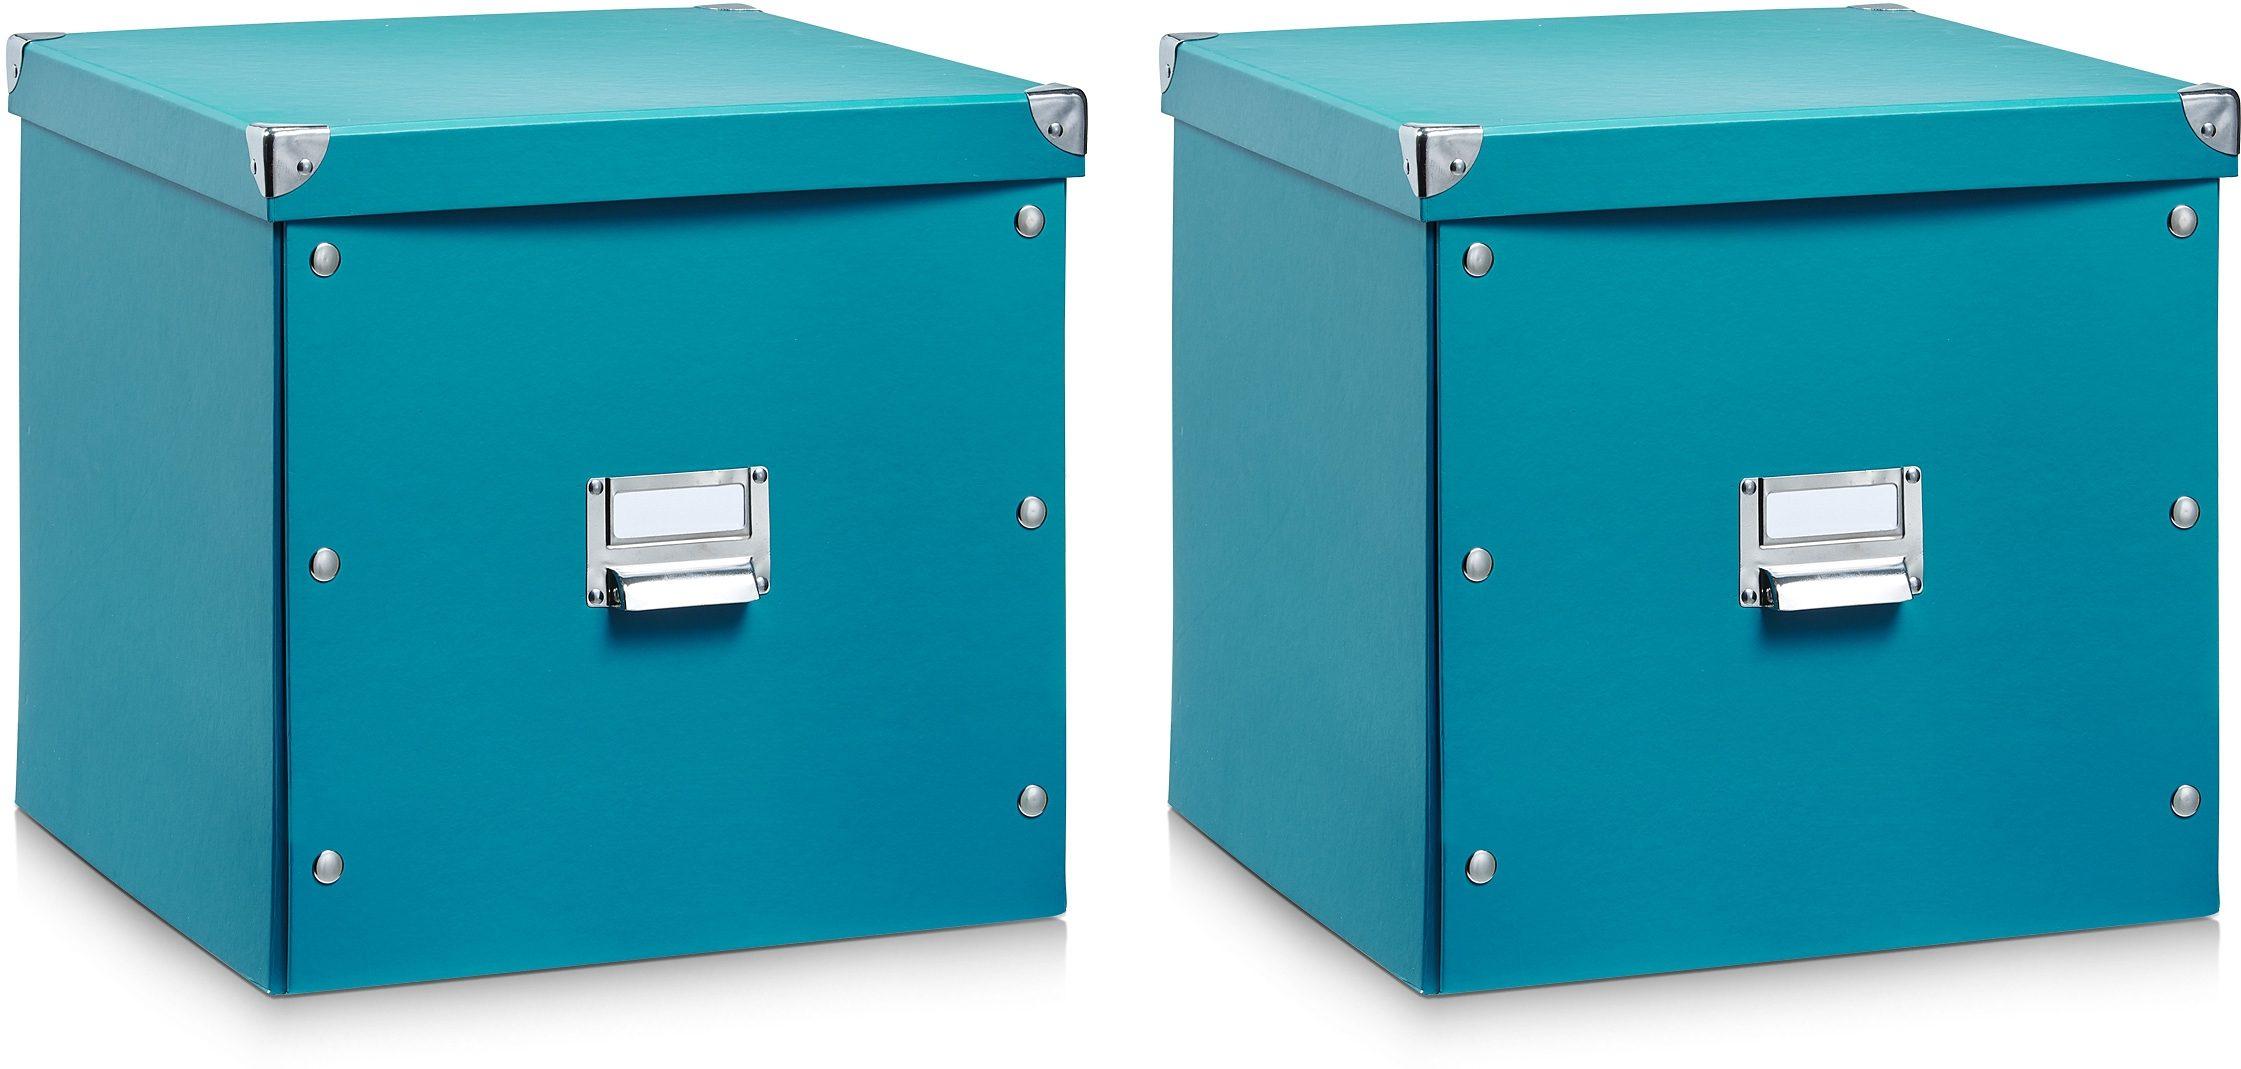 Aufbewahrungsbox, Home affaire (2er-Set)